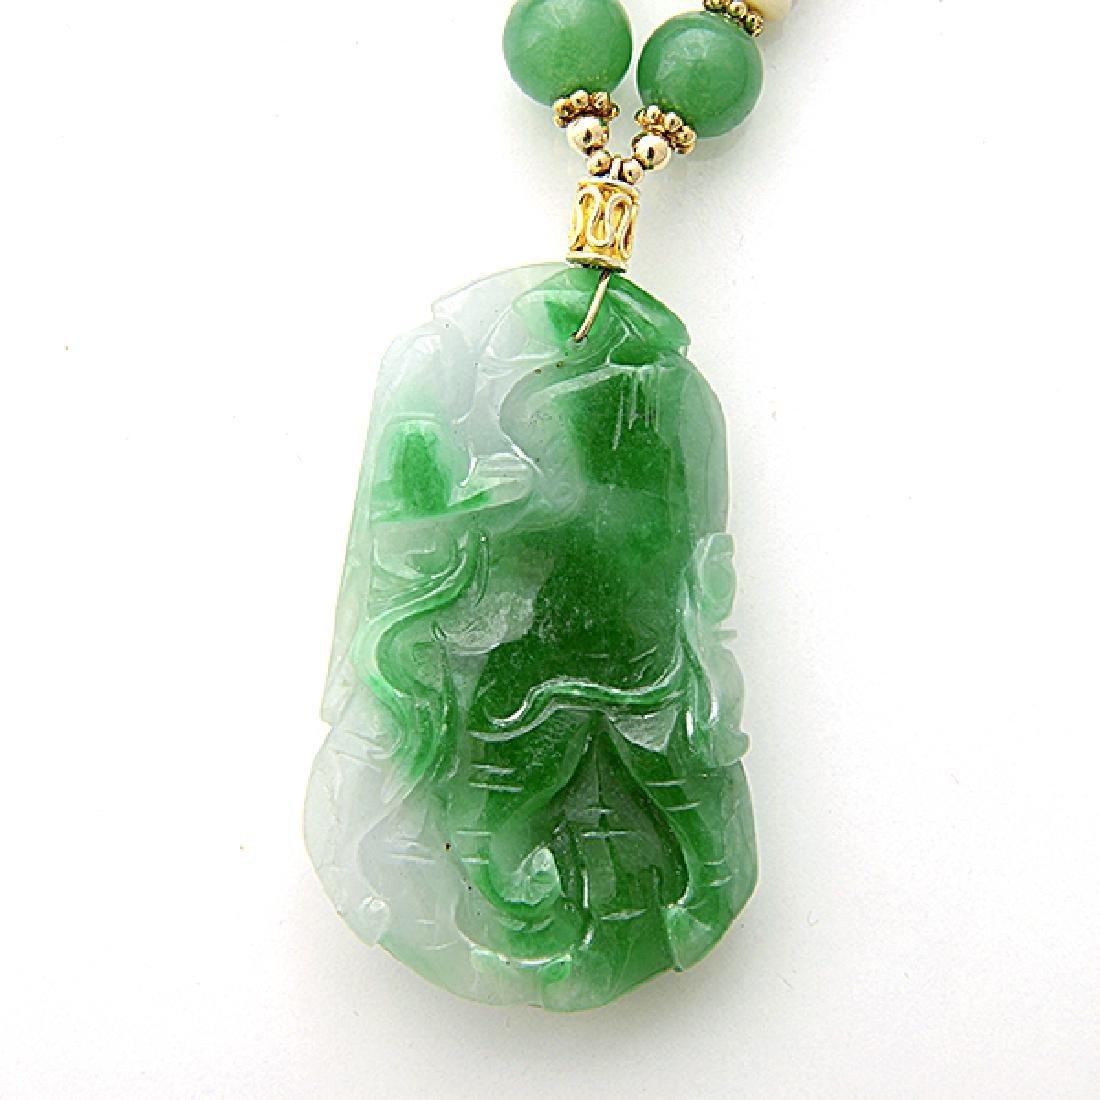 Jade, Quench Crackled Quartz, Vermeil Necklace. - 3